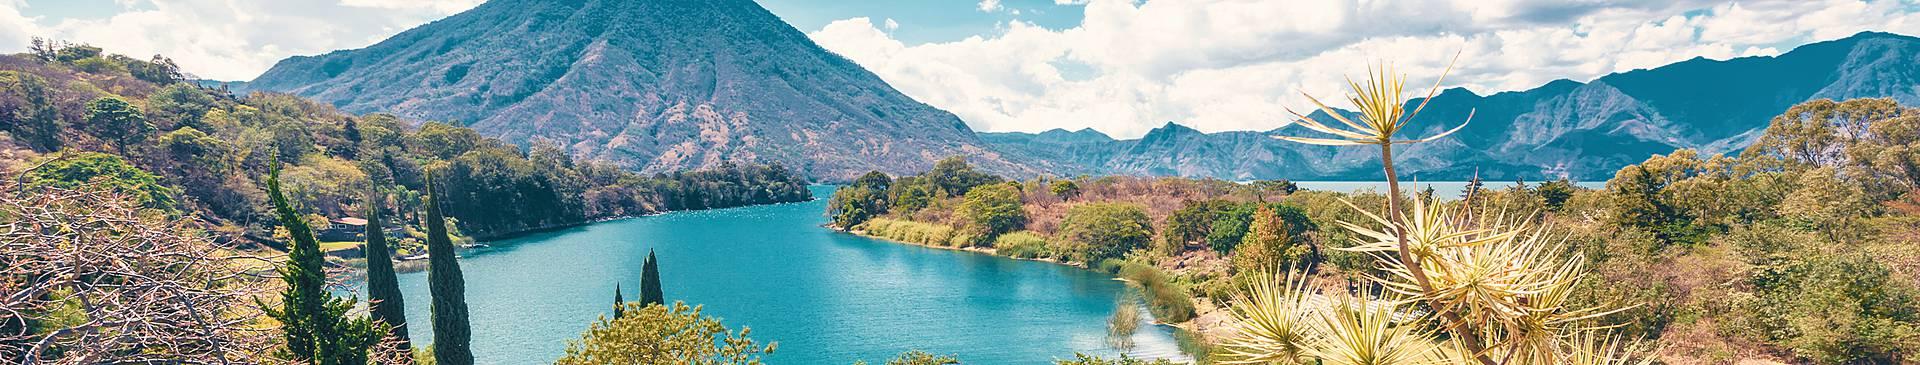 Viaggi in Guatemala in estate